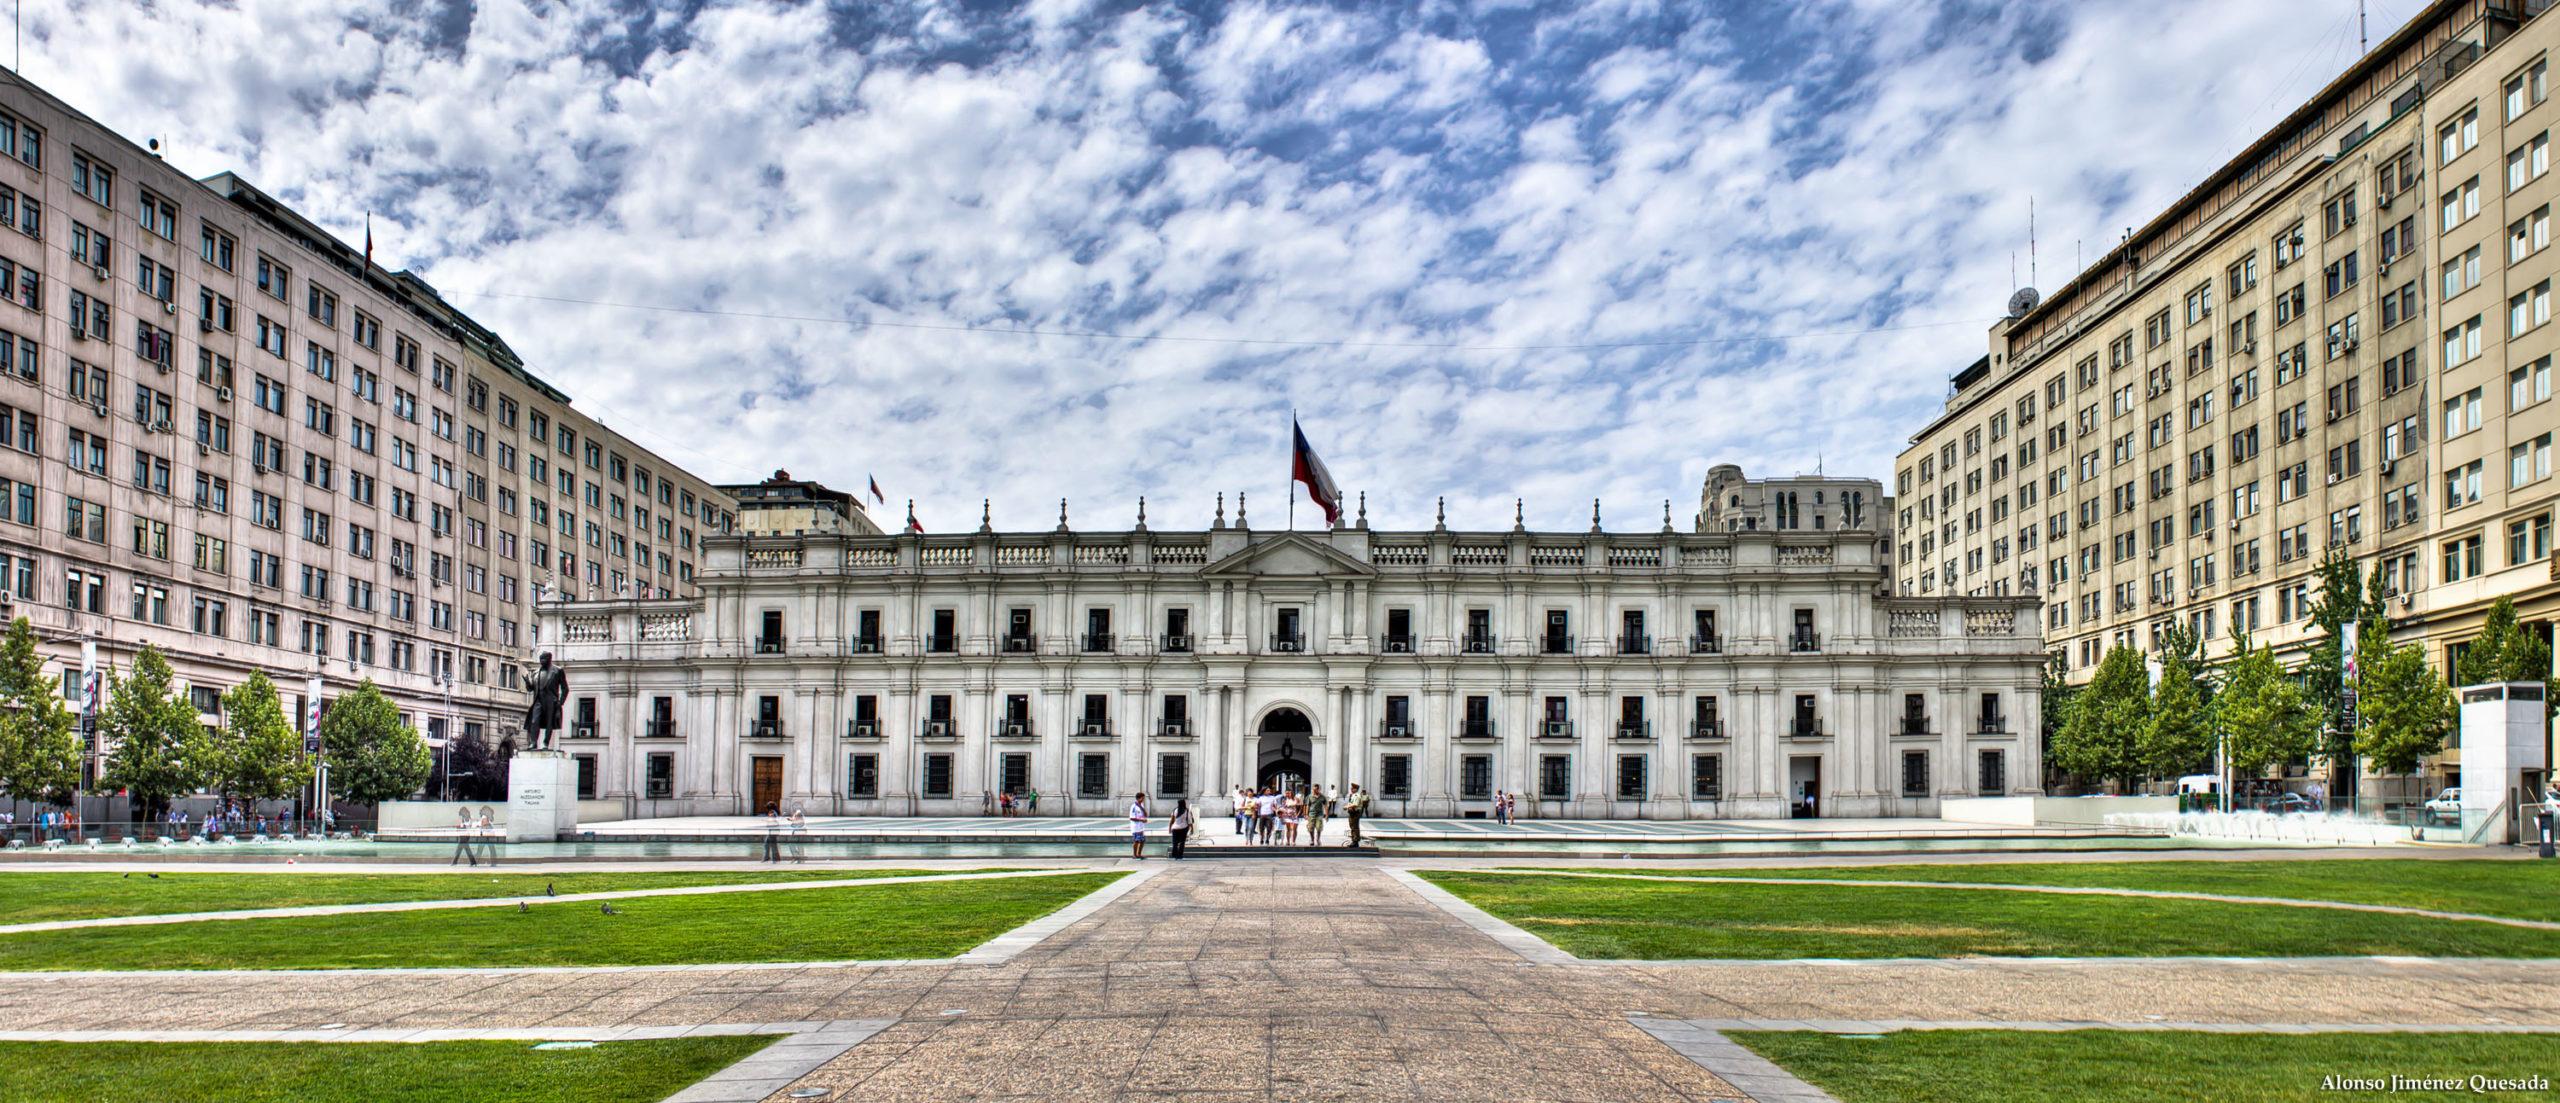 Фото дворца Ла Монеда